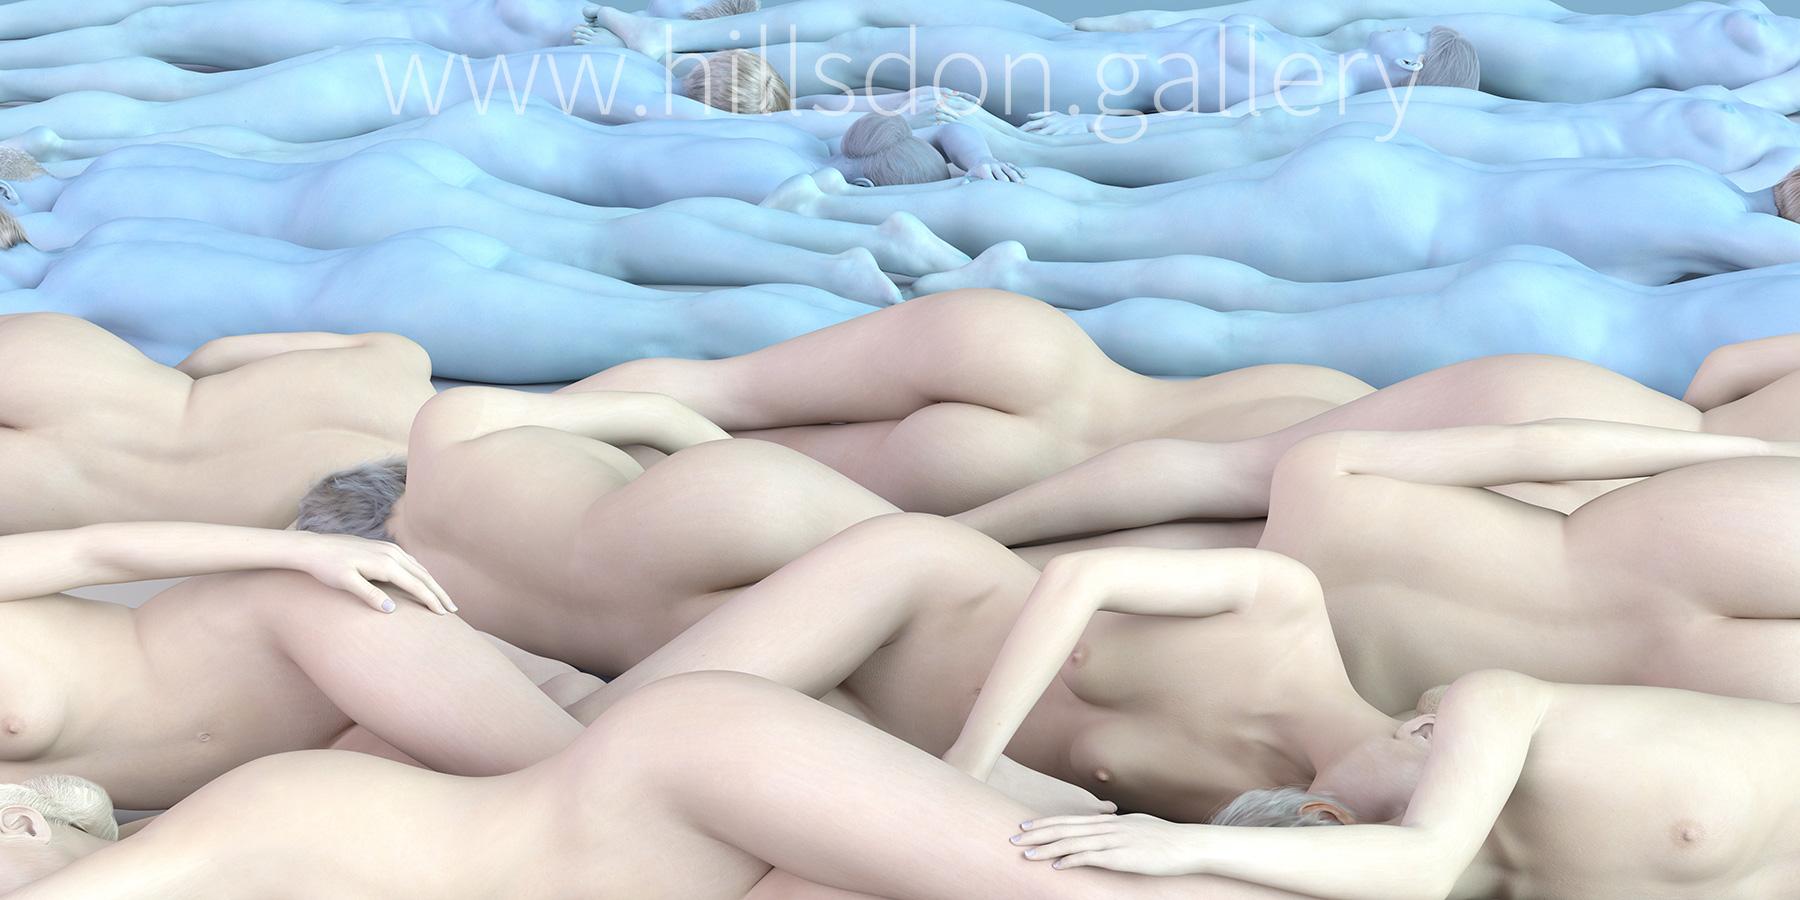 Naked Landscape (White) by Mark Hillsdon